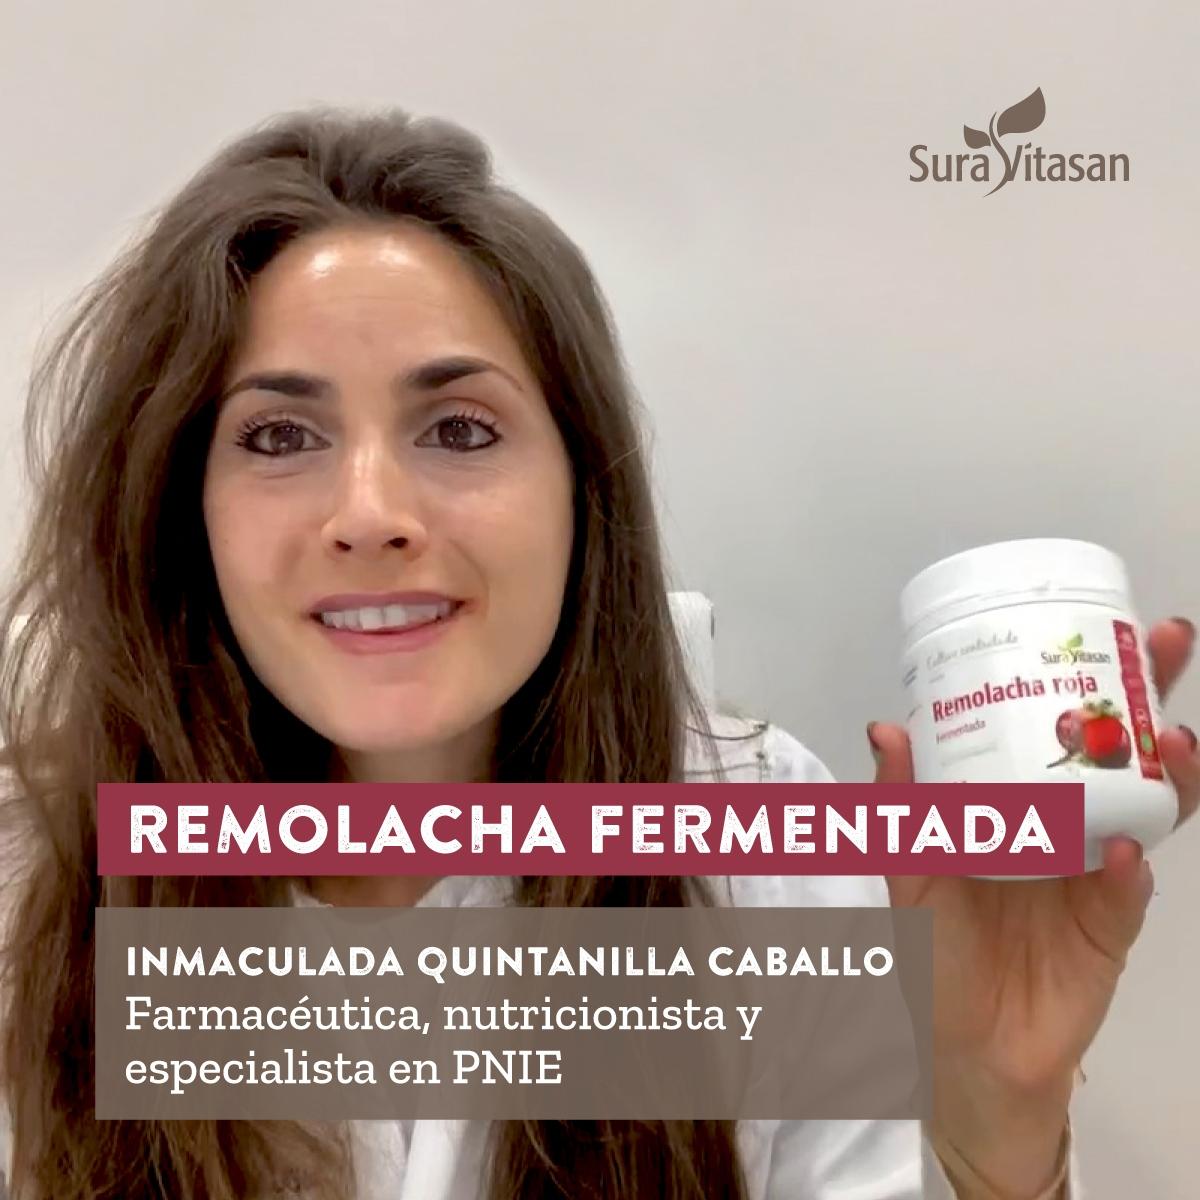 Remolacha Roja Fermentada - Videoconsejo